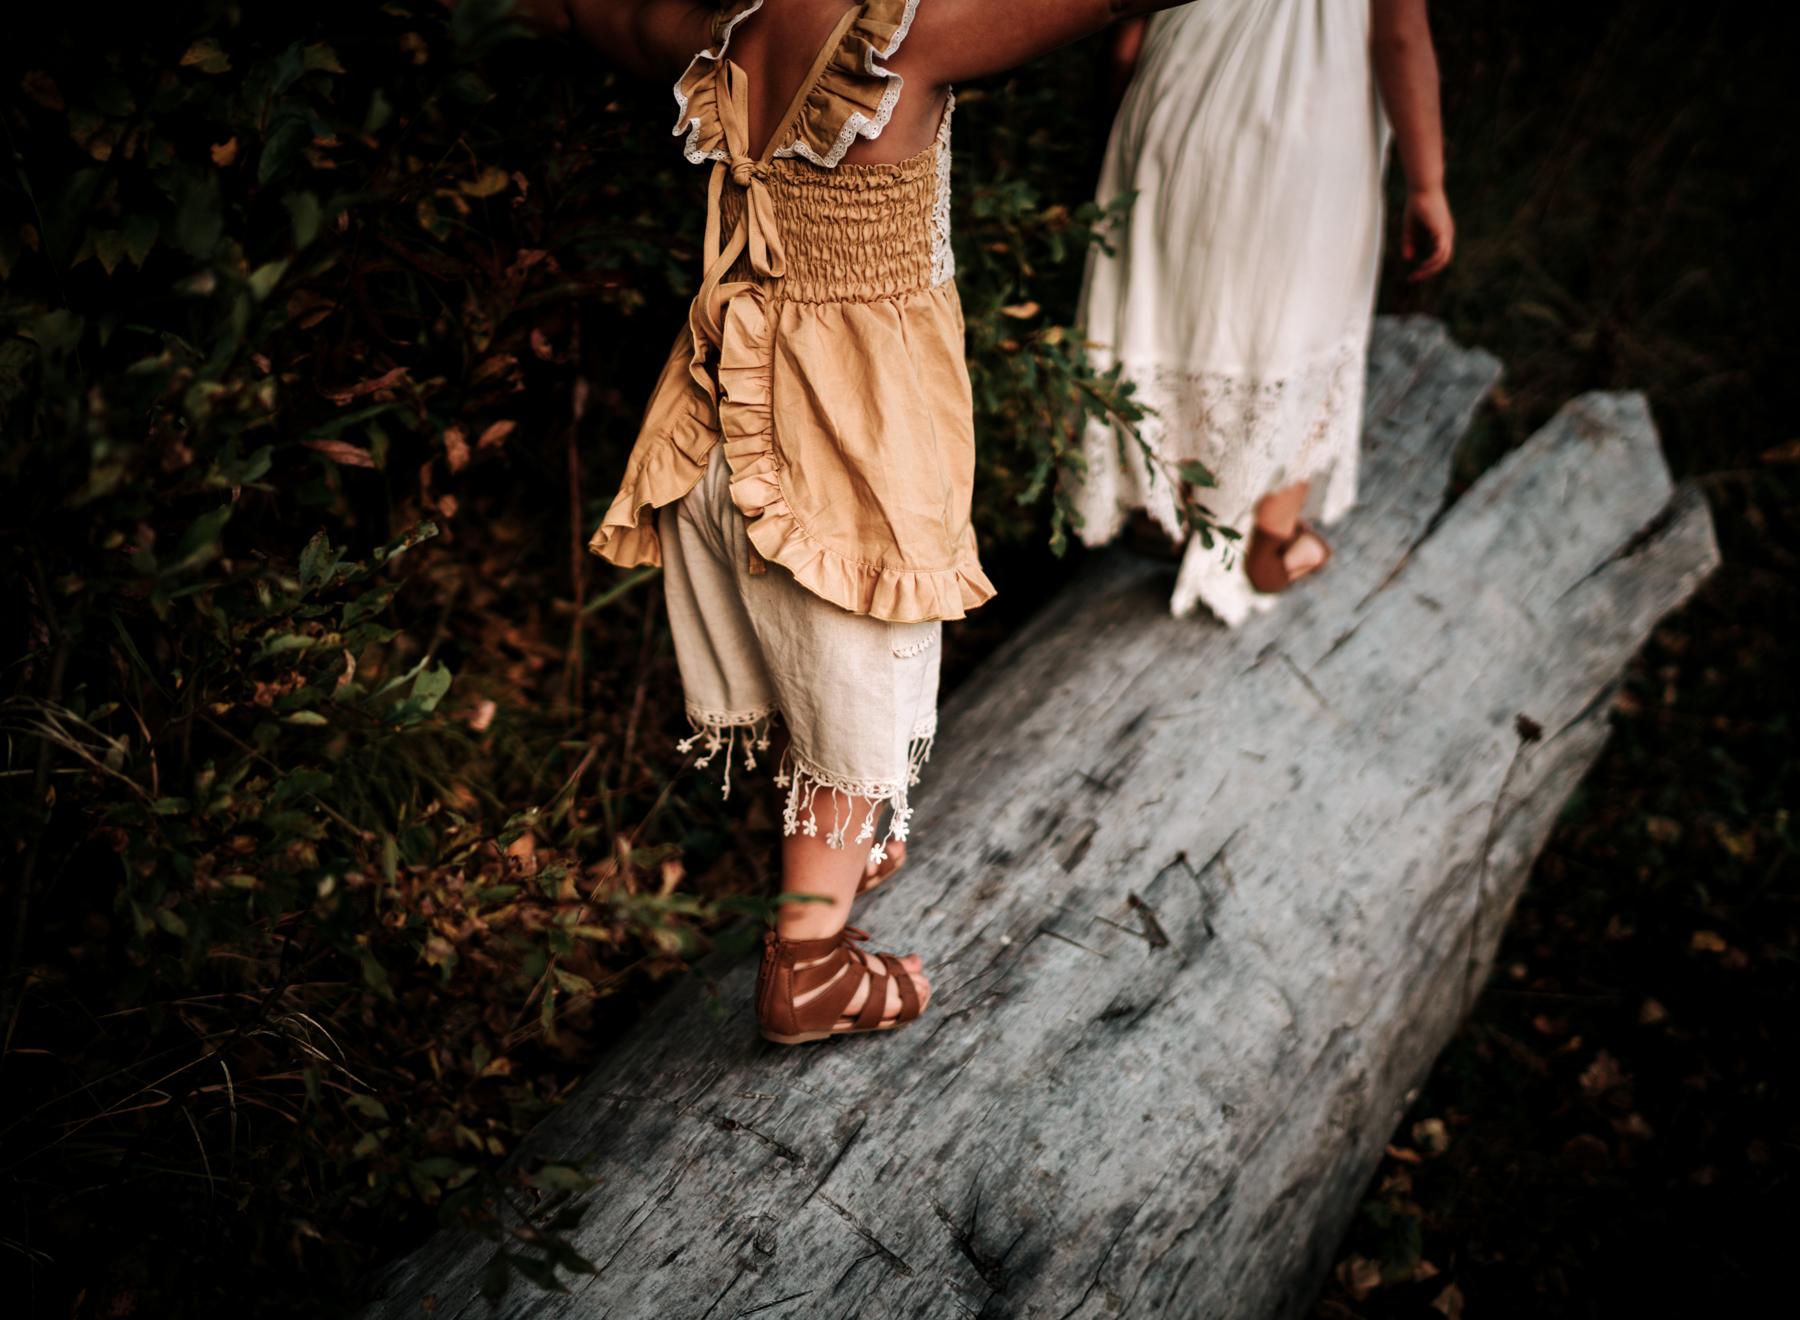 anchoragefamilyphotographer4.jpg